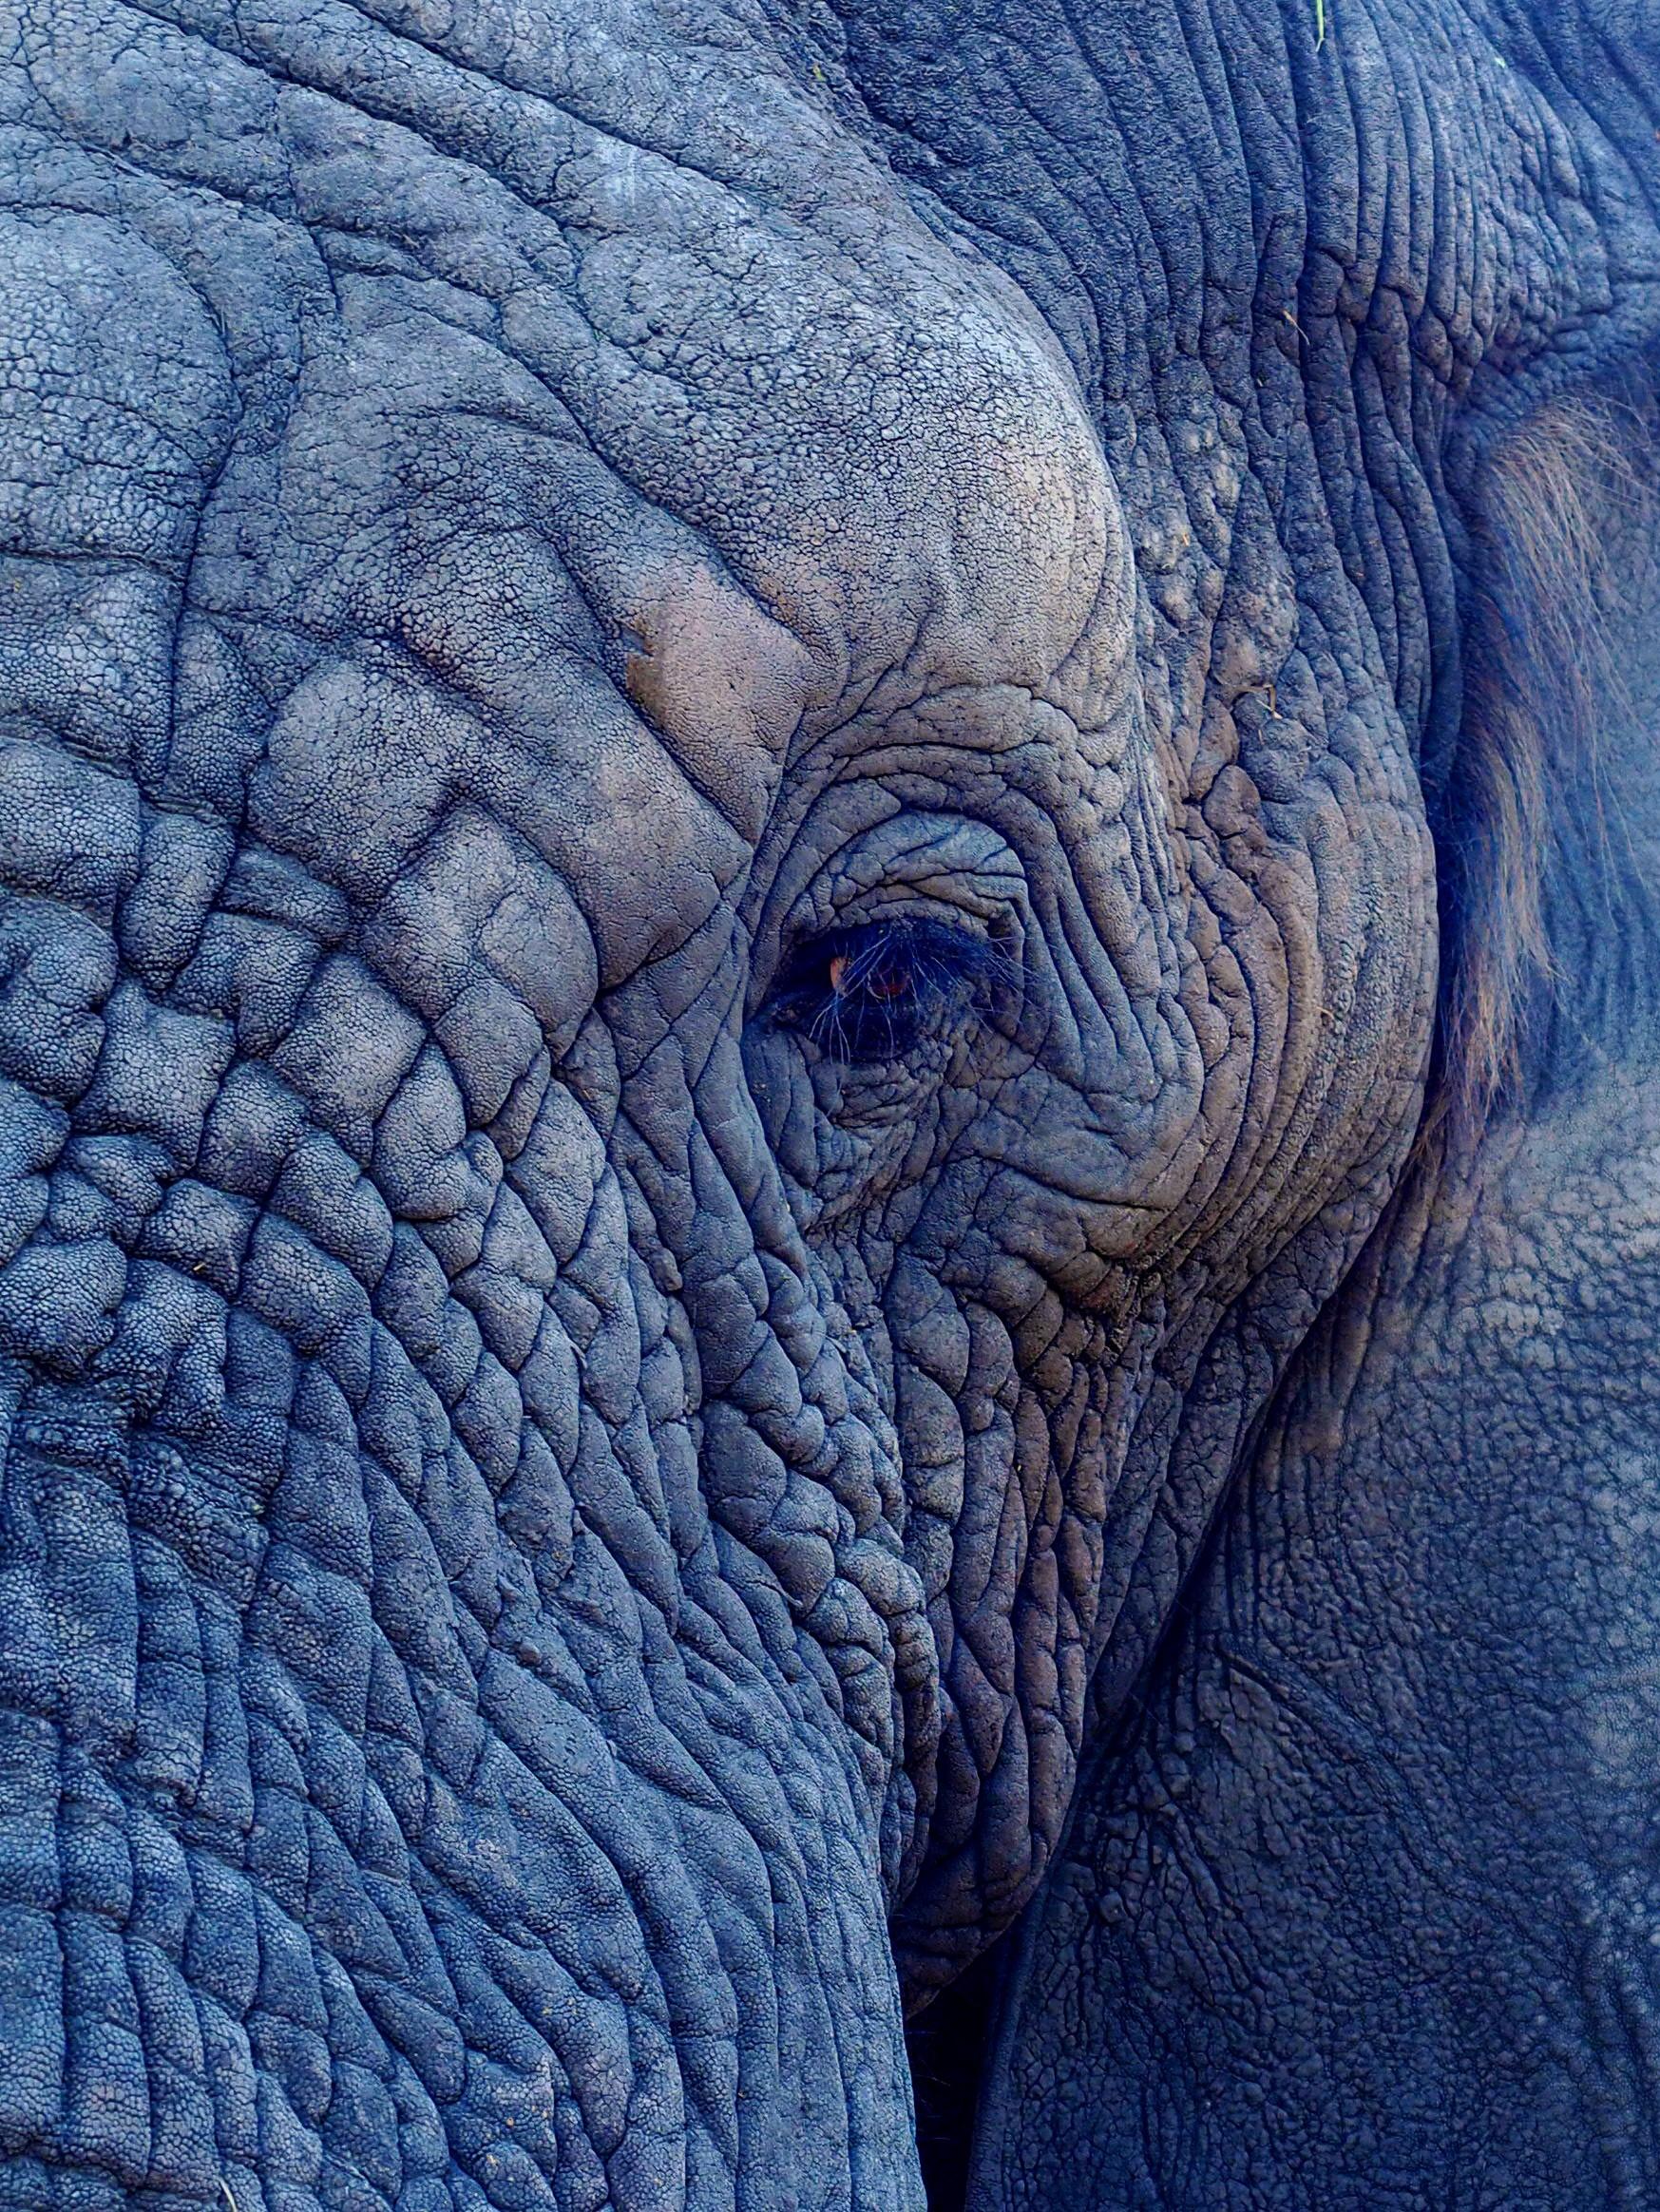 jennifer latuperisa andresen elephant profile Up cW.jpg